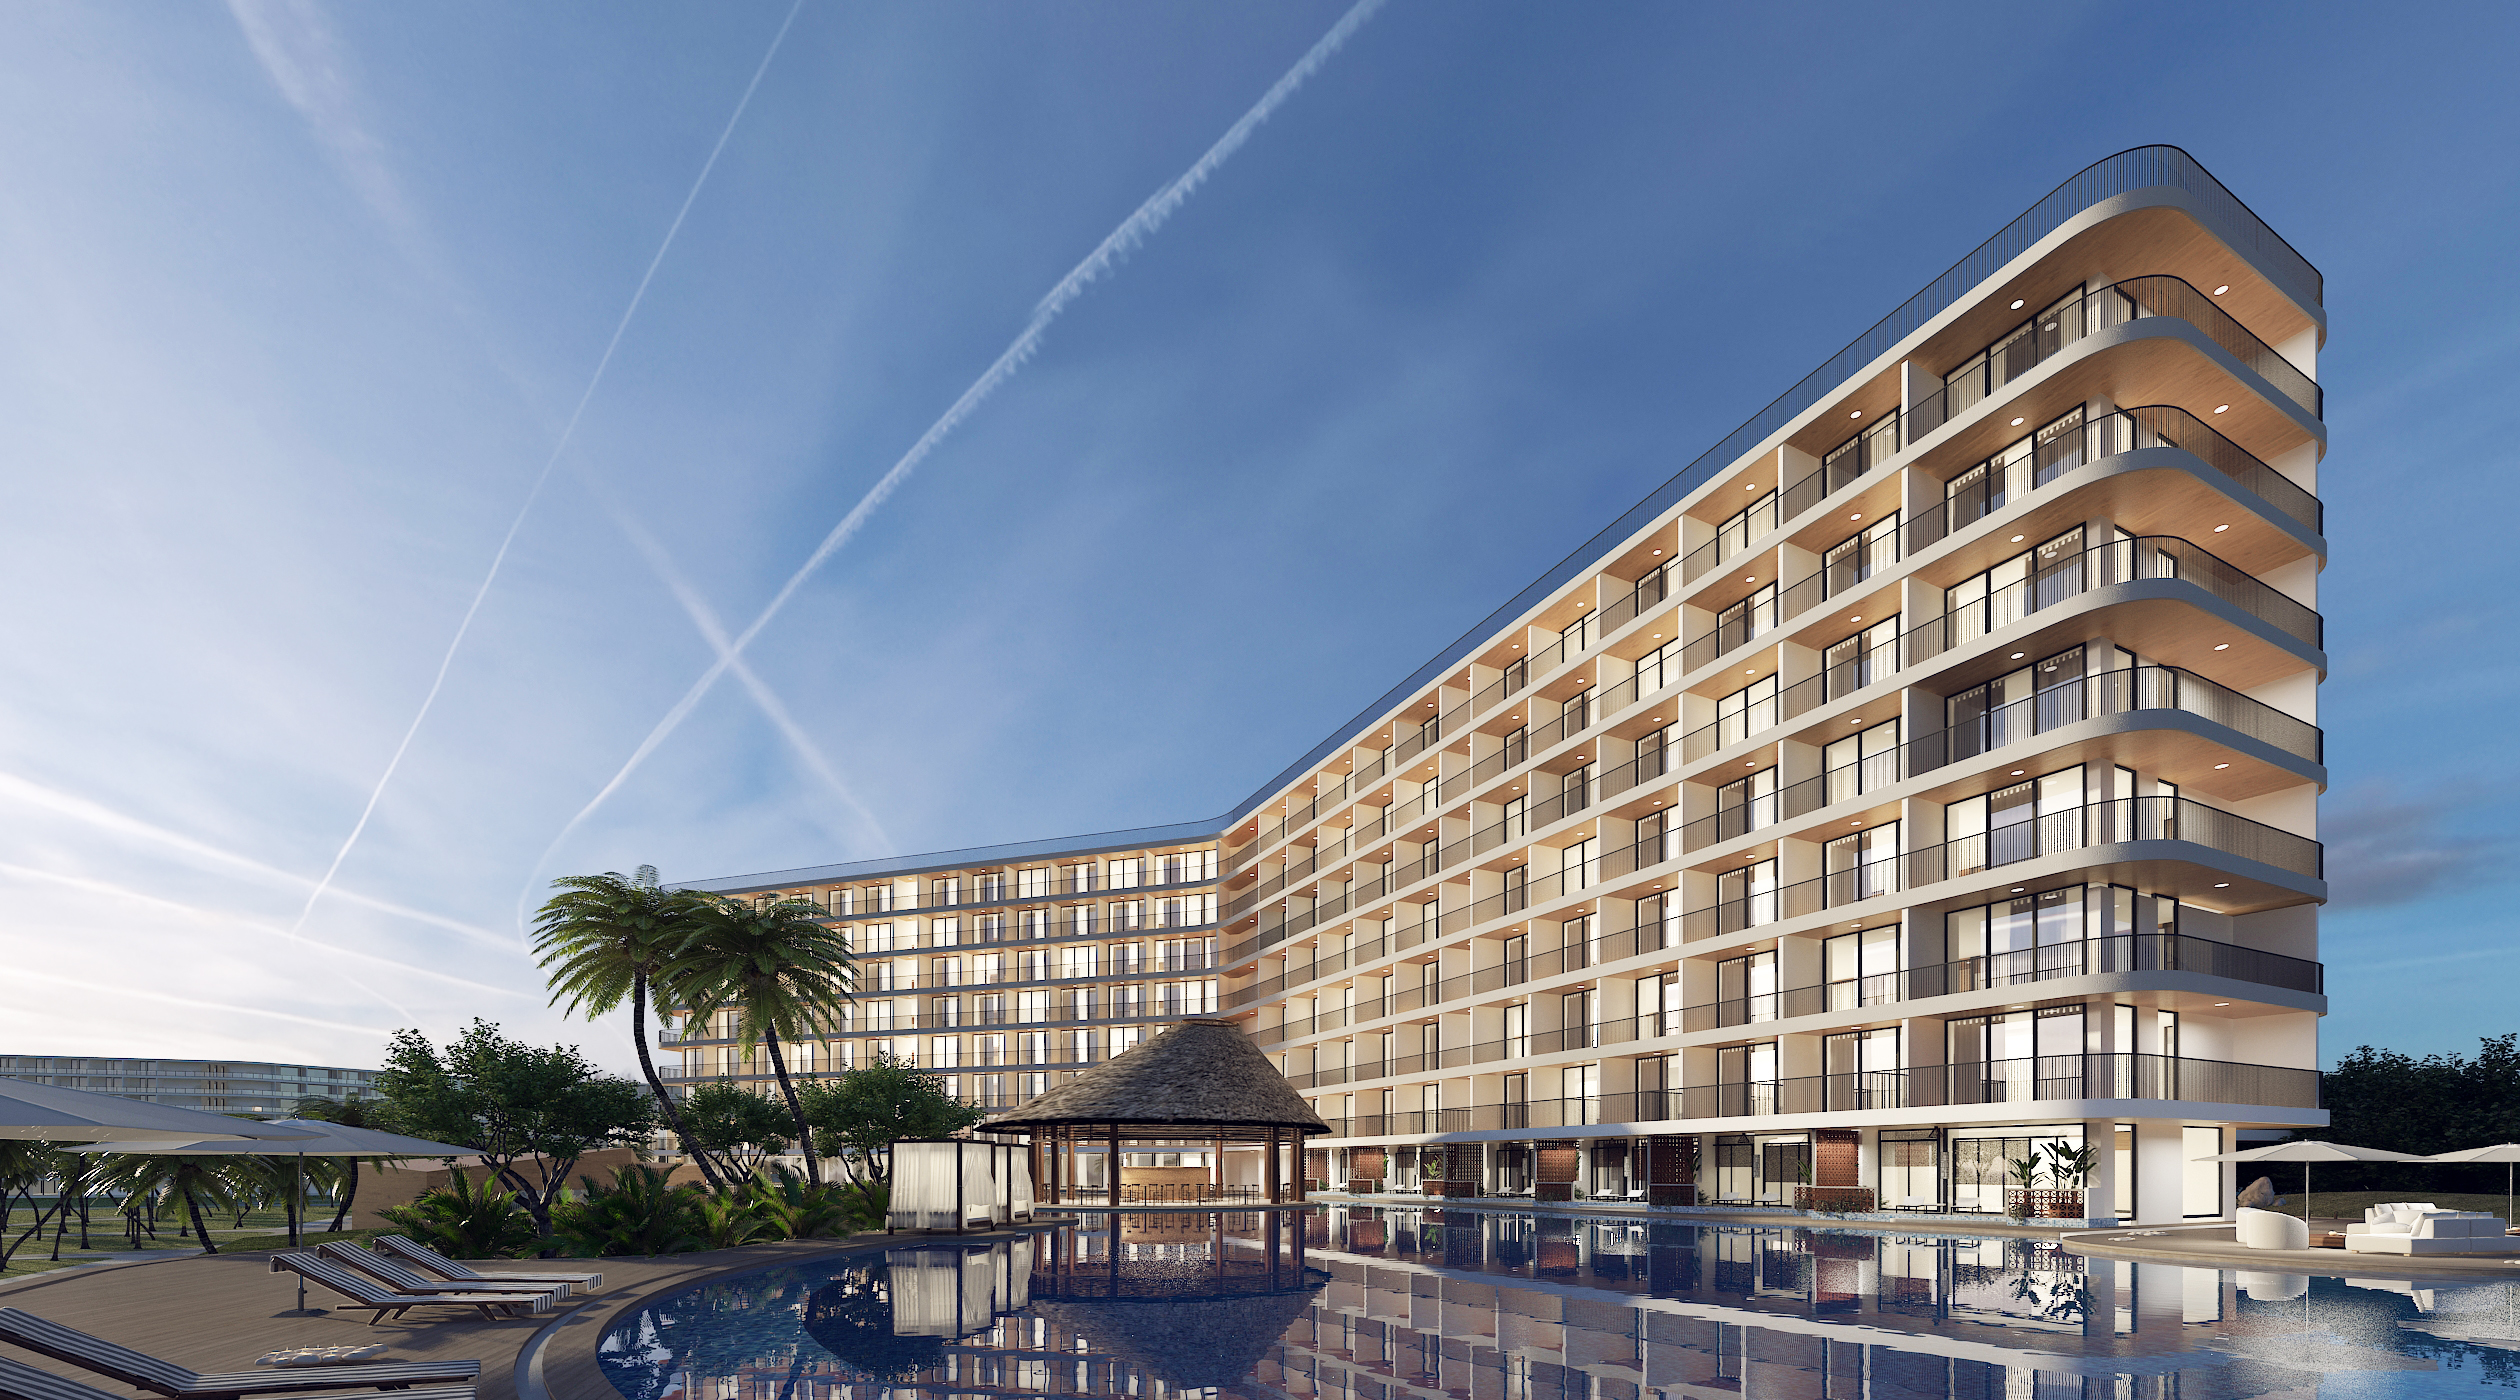 Hotel010